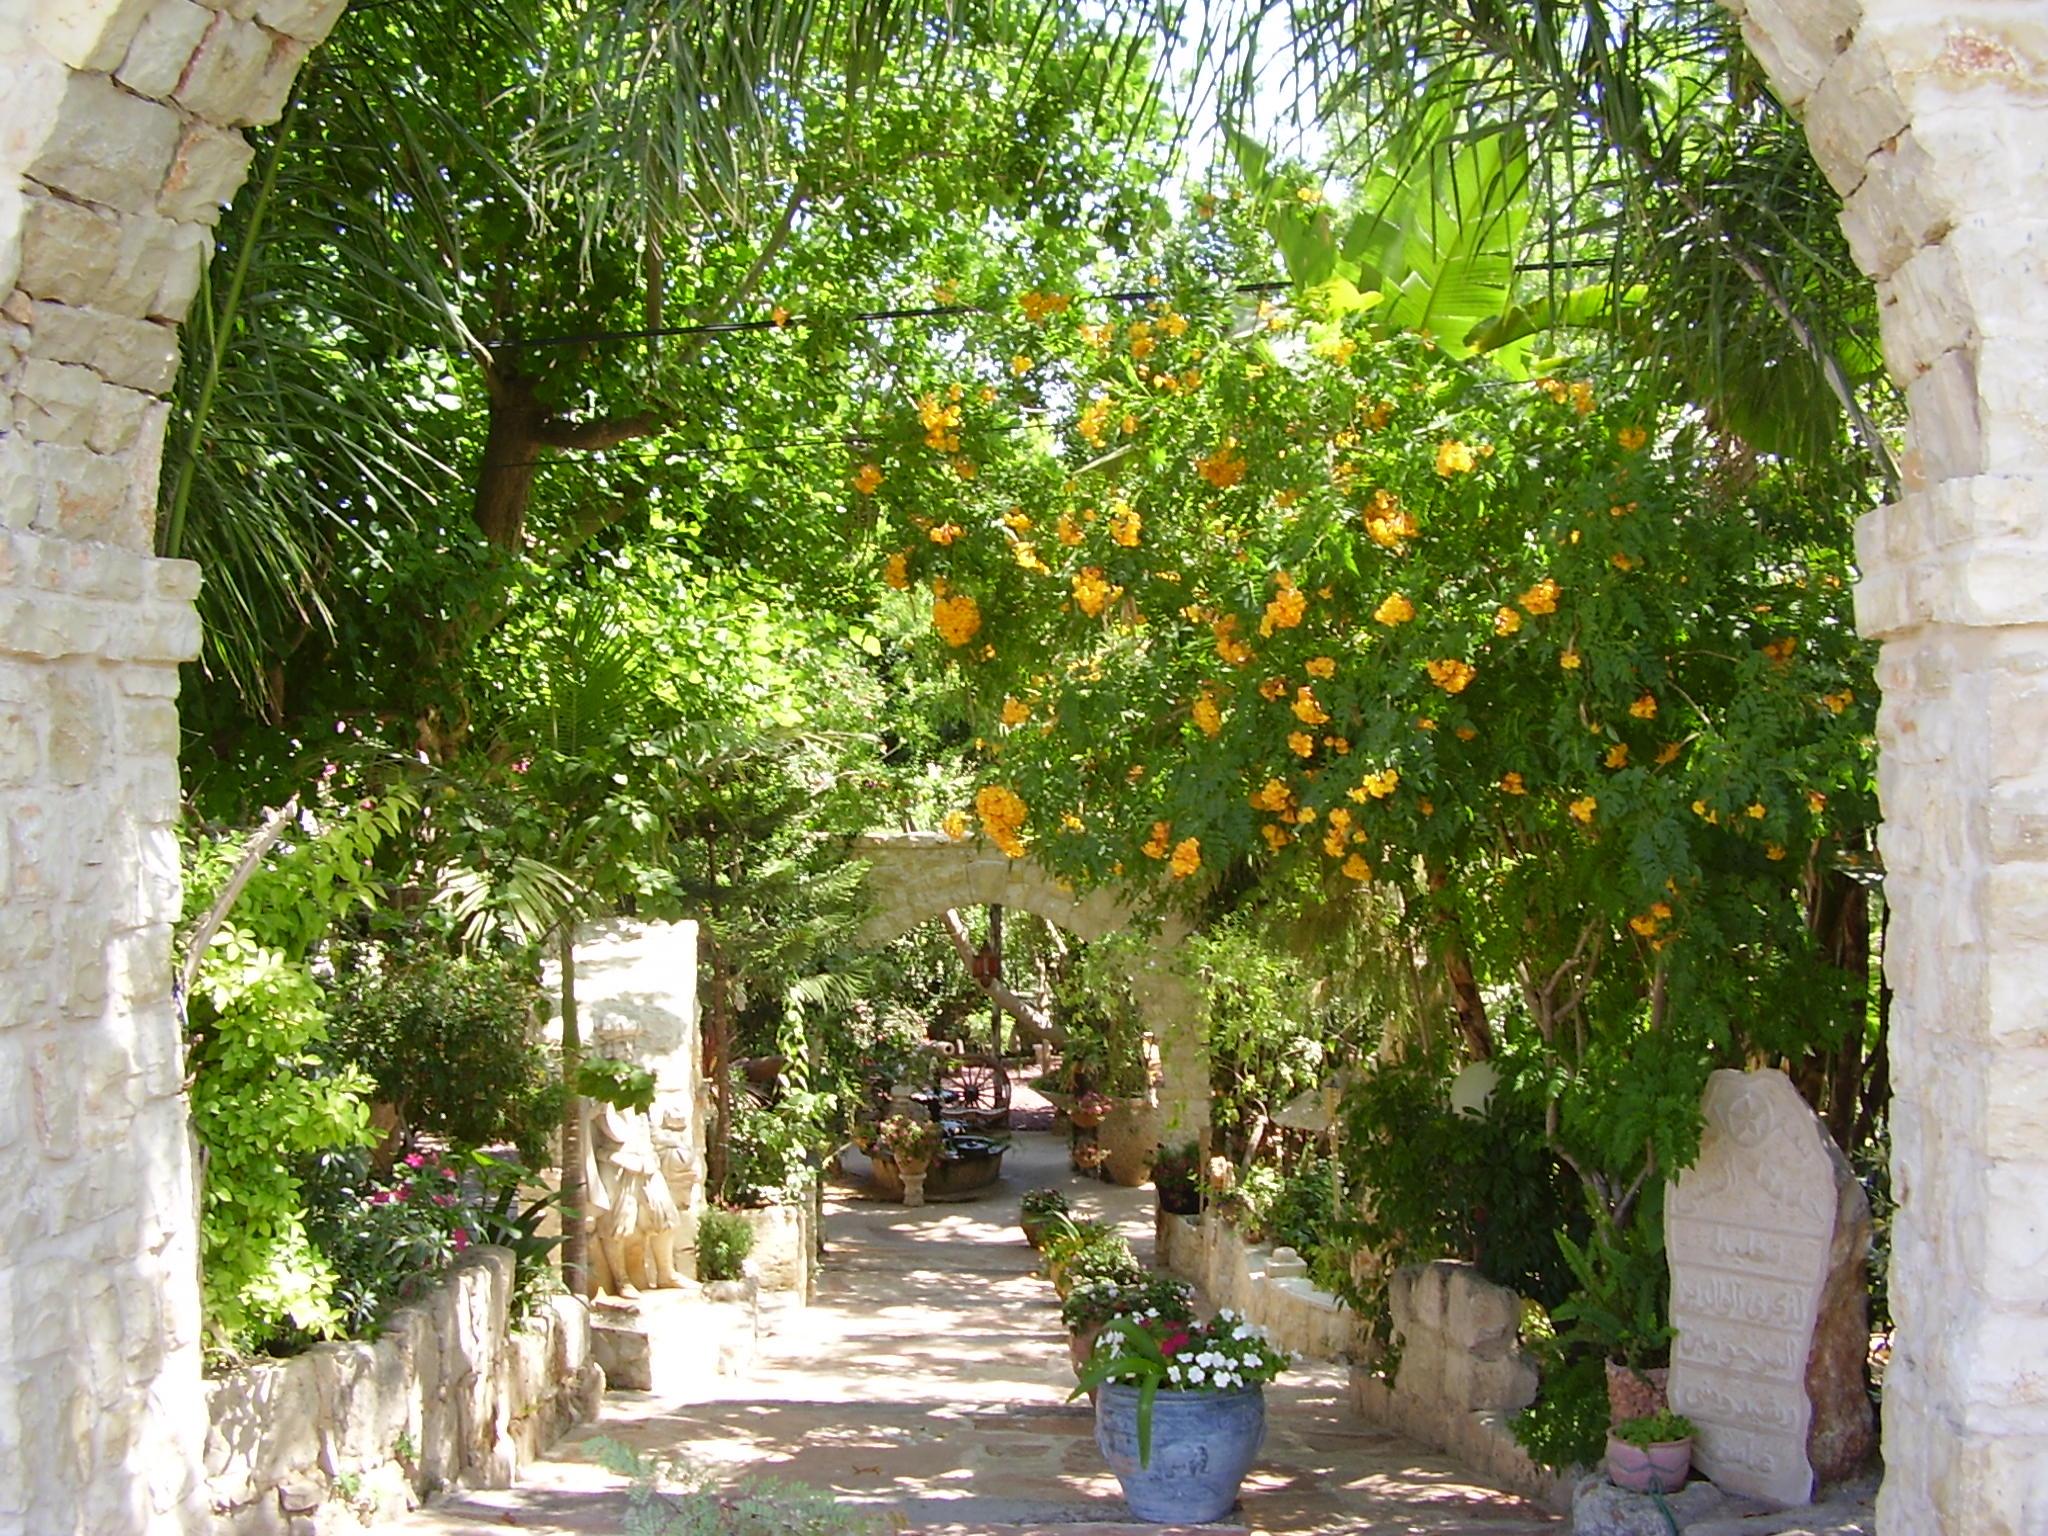 El Mona Gardens. Via wikimedia.org